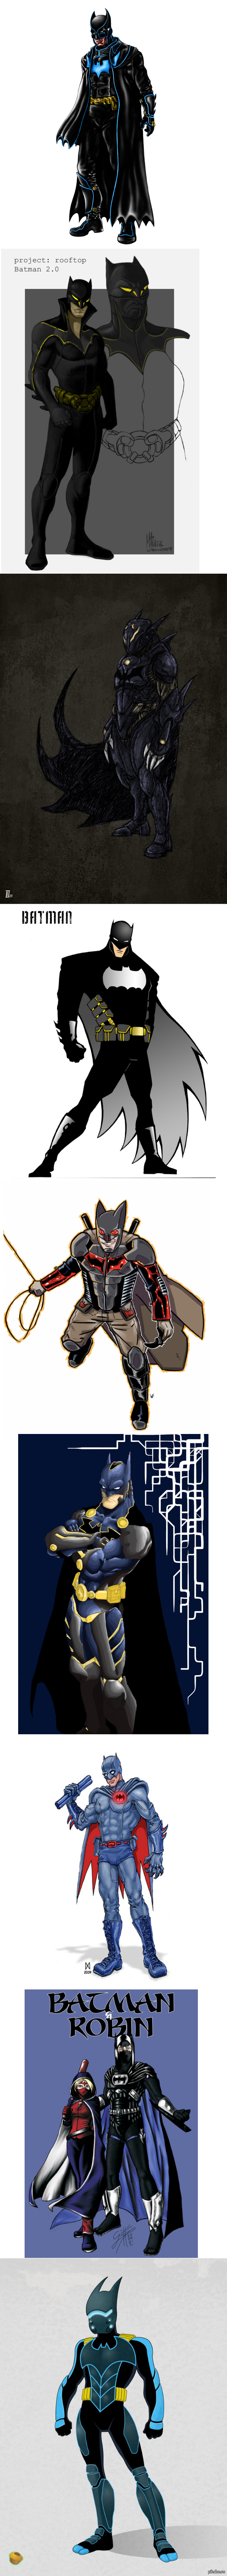 Бэтмэн, каким он мог бы быть Человек-Летучий Мыш. Много Человеков-Летучих Мышов. Очень длиннопост.